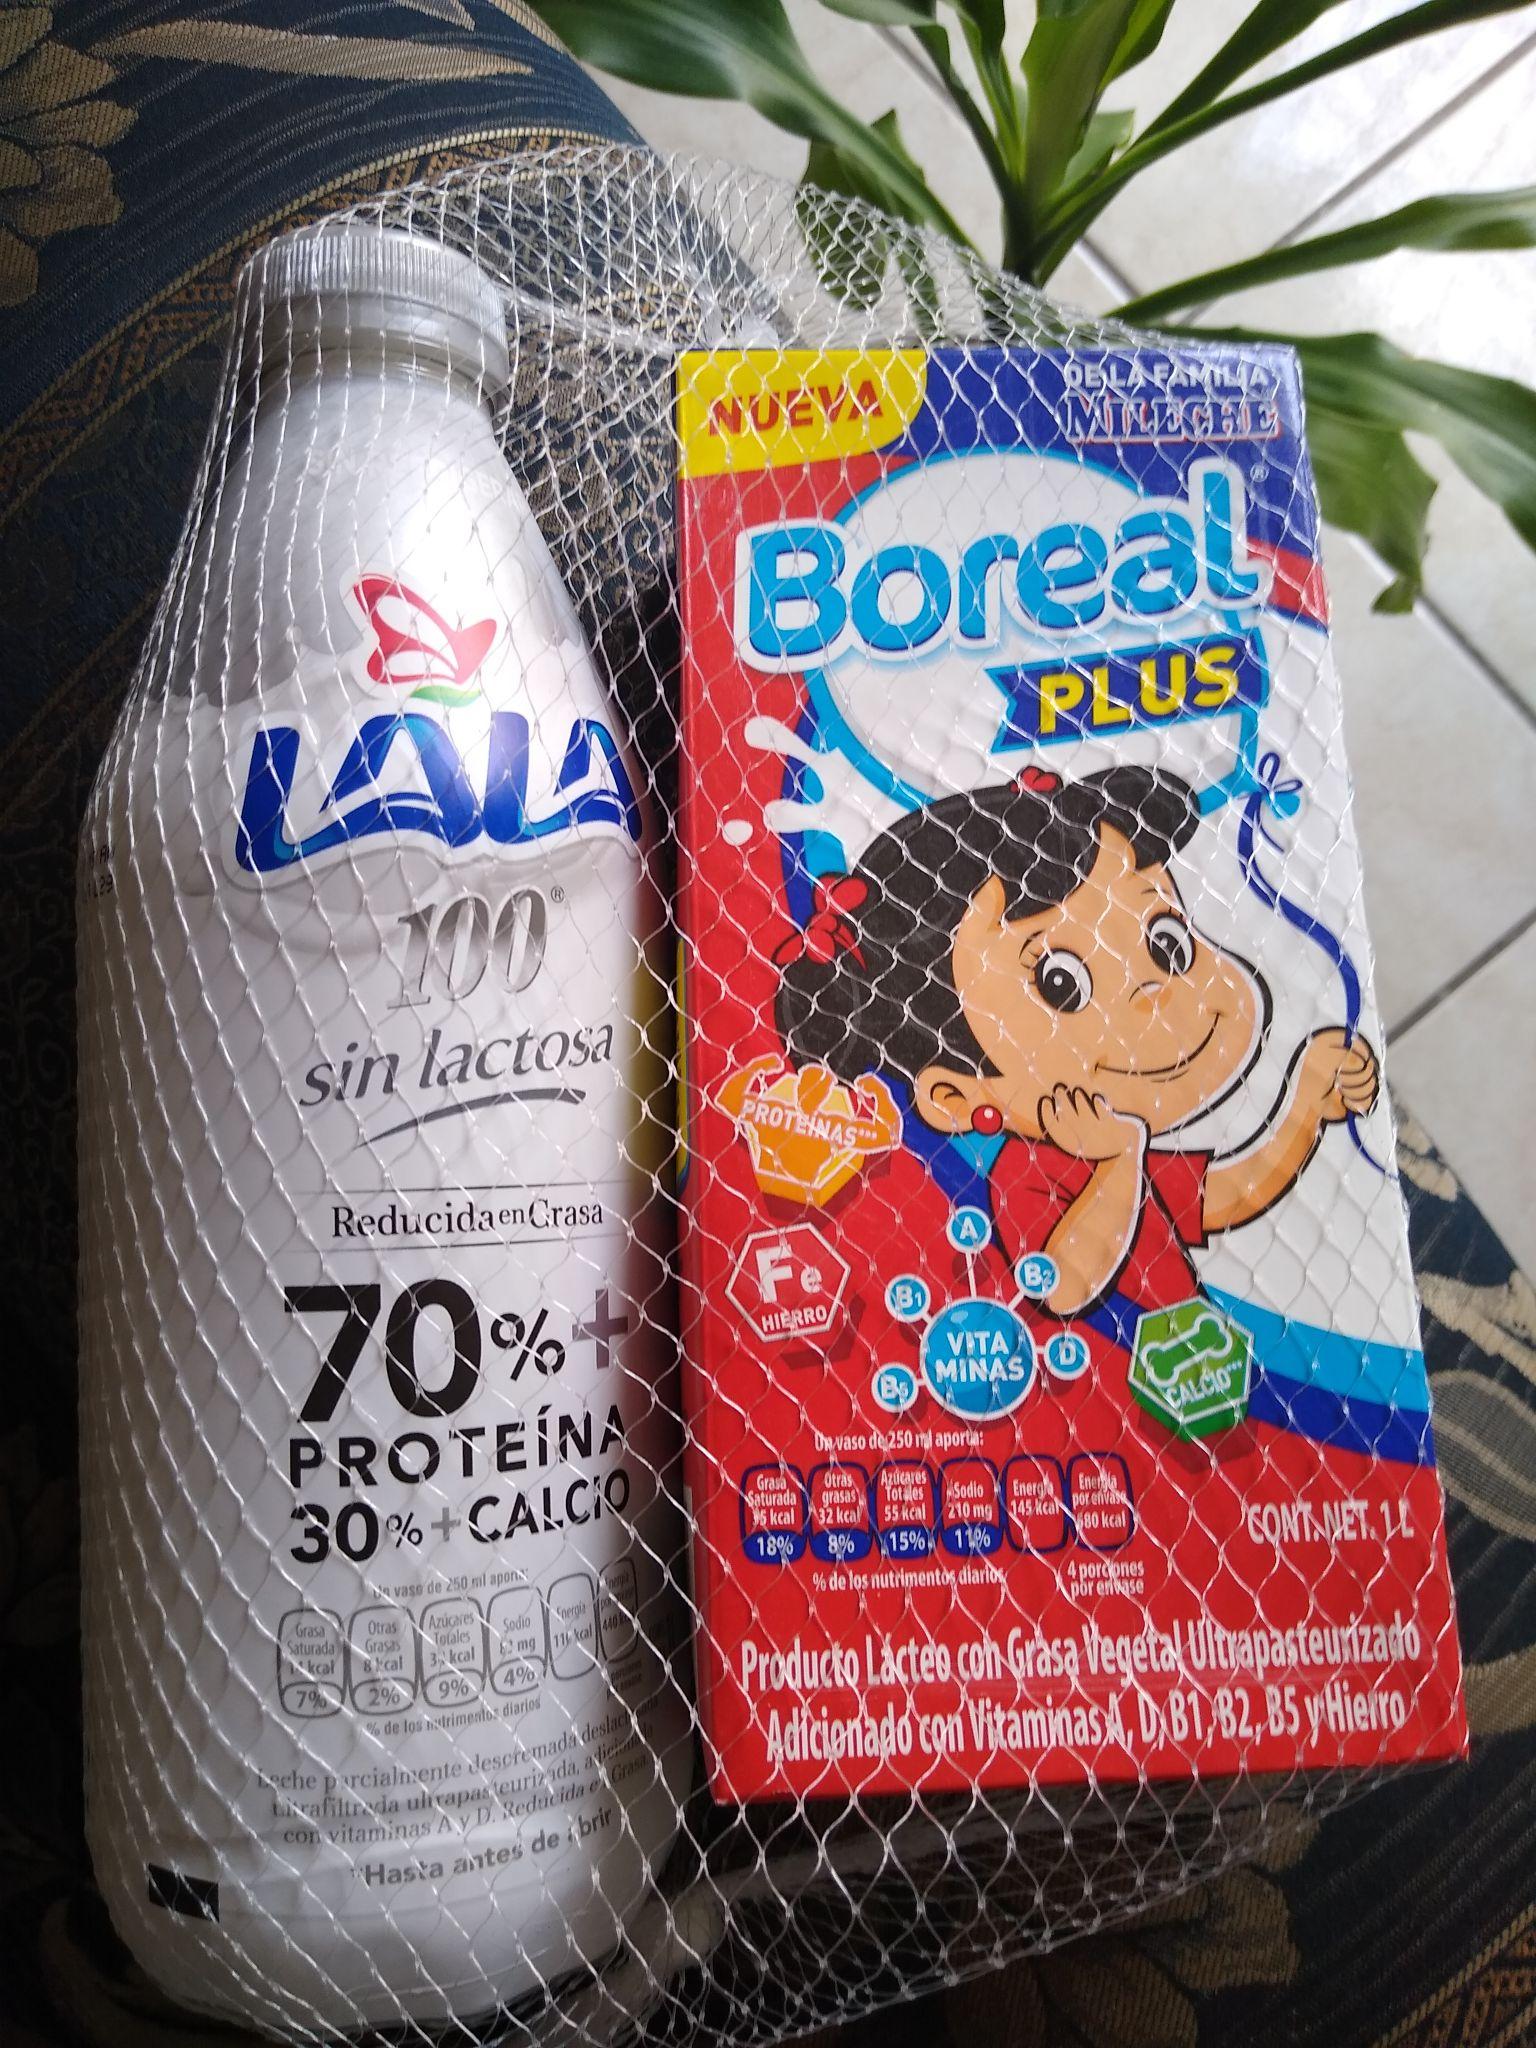 Chedraui Leche lala 100 sin lactosa + leche boreal